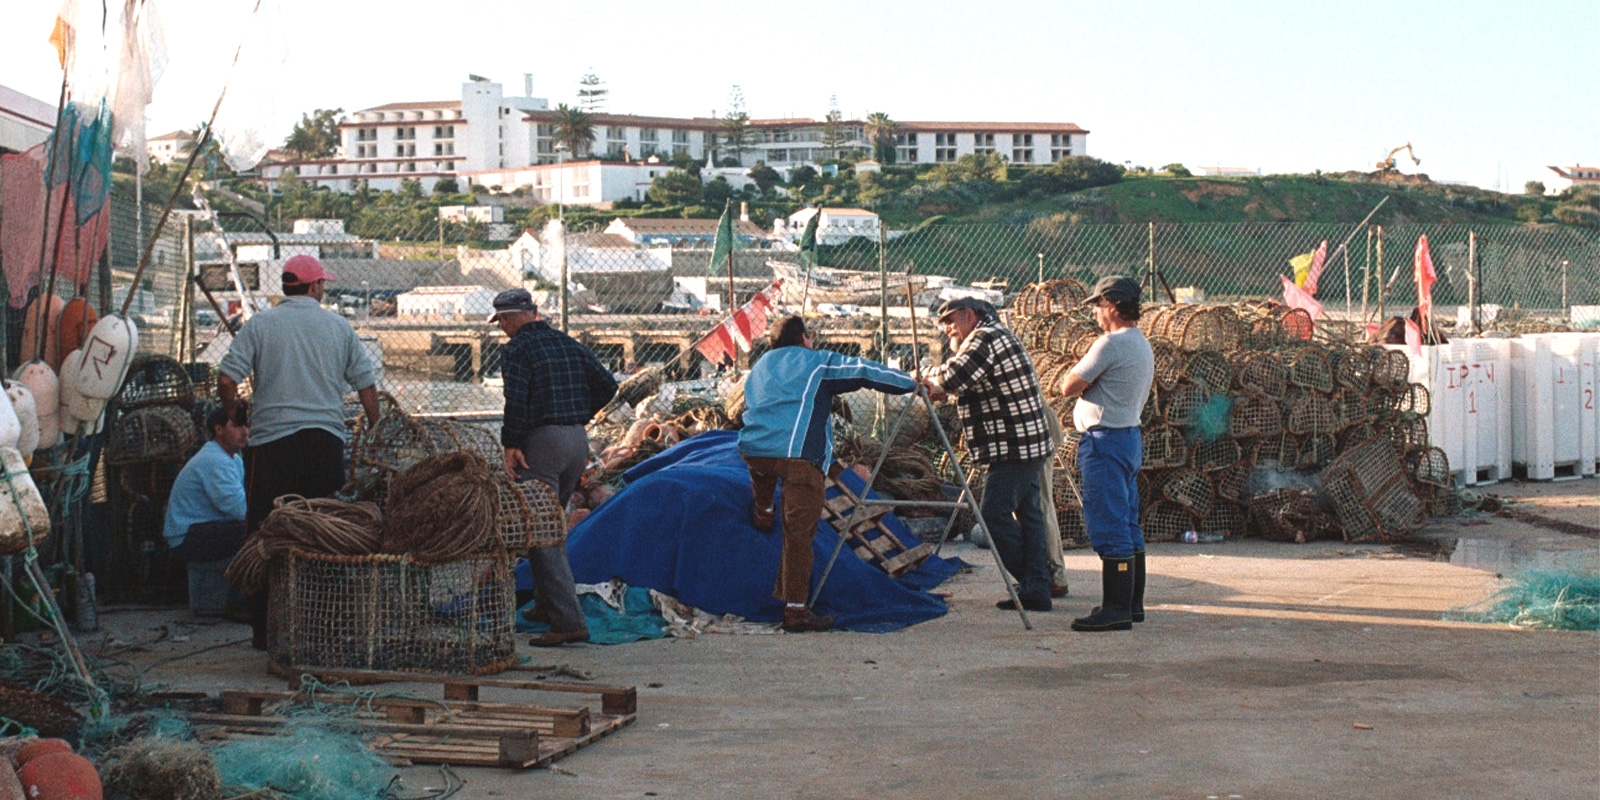 People Of The Algarve Algarve Portal